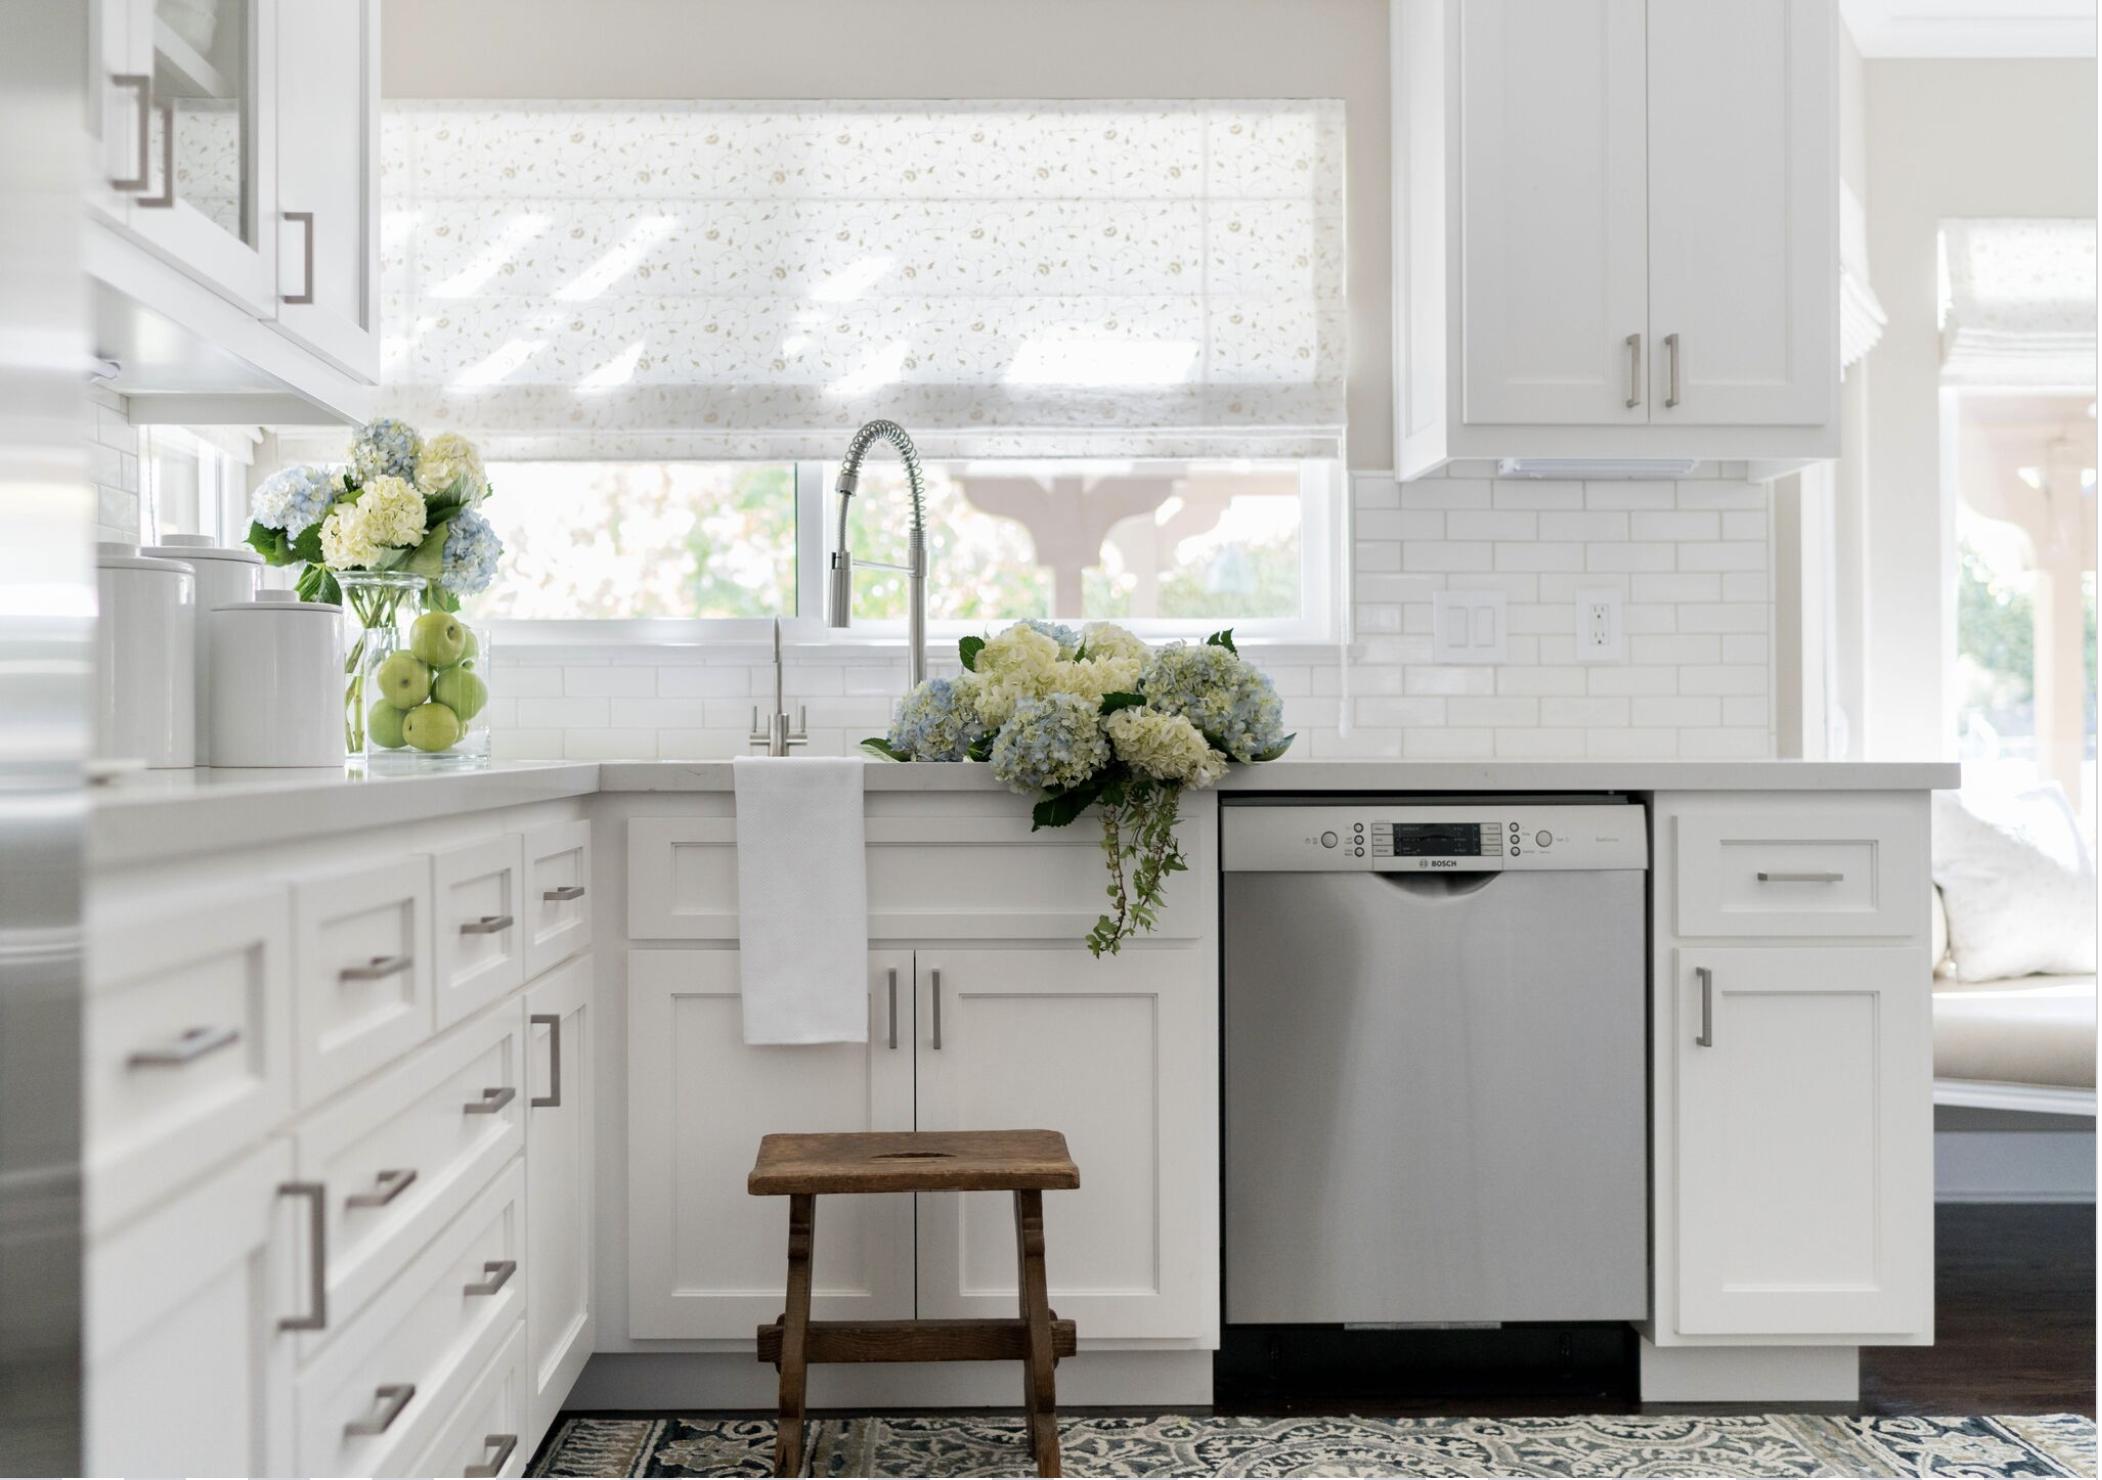 Four Point Design Build designed this dreamy white kitchen.